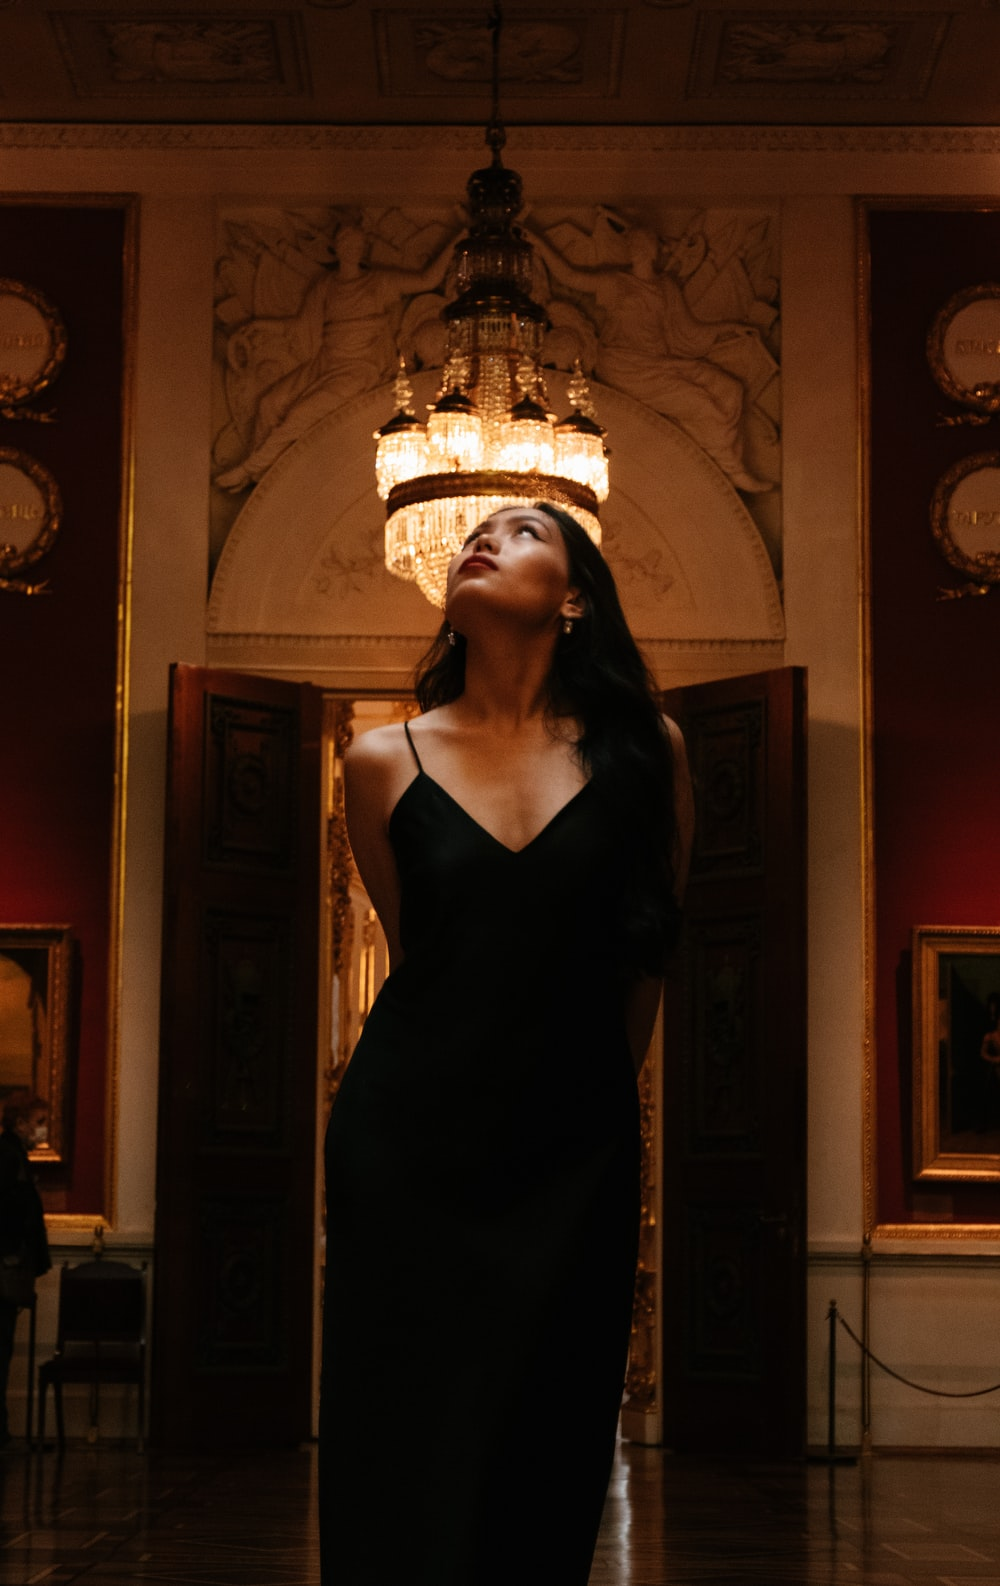 woman in black spaghetti strap dress standing near brass framed wall mirror